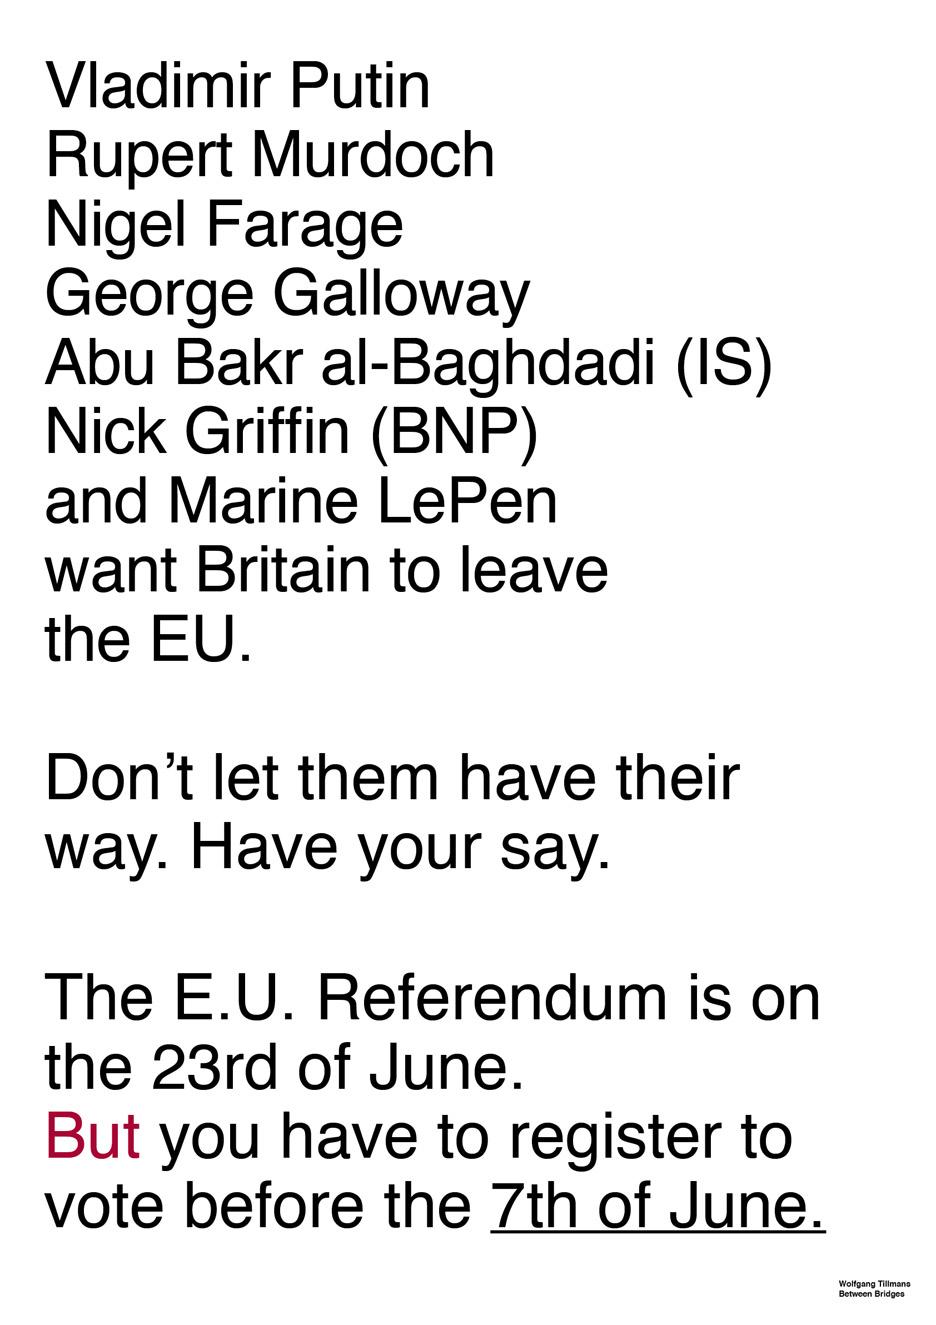 eu-referendum-remain-campaign-posters-by-wolfgang-tillmans_dezeen_936_6